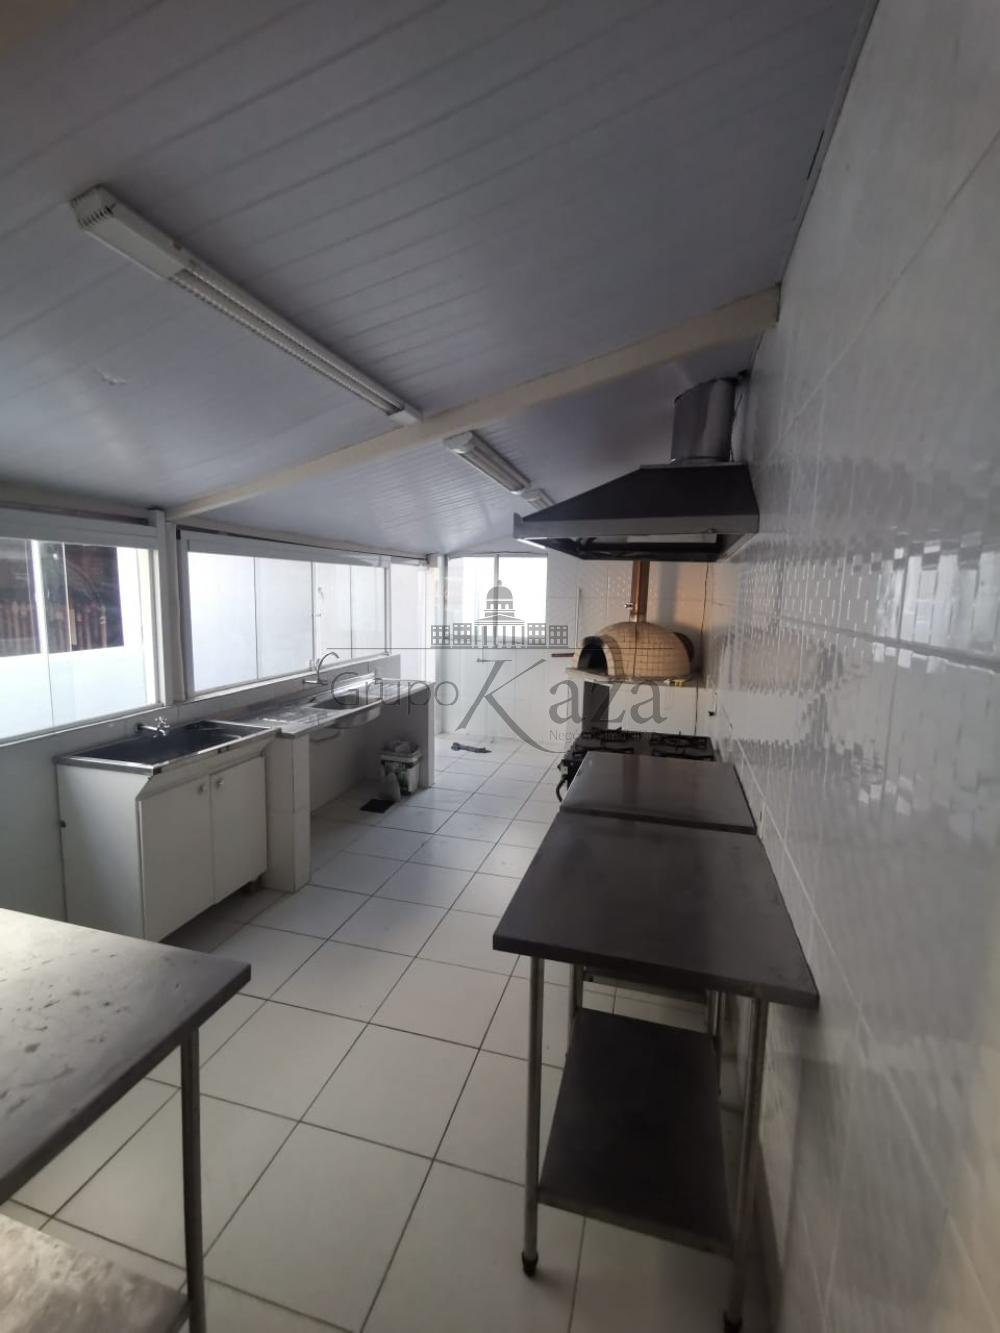 Alugar Comercial/Industrial / Casa em São José dos Campos R$ 3.000,00 - Foto 8